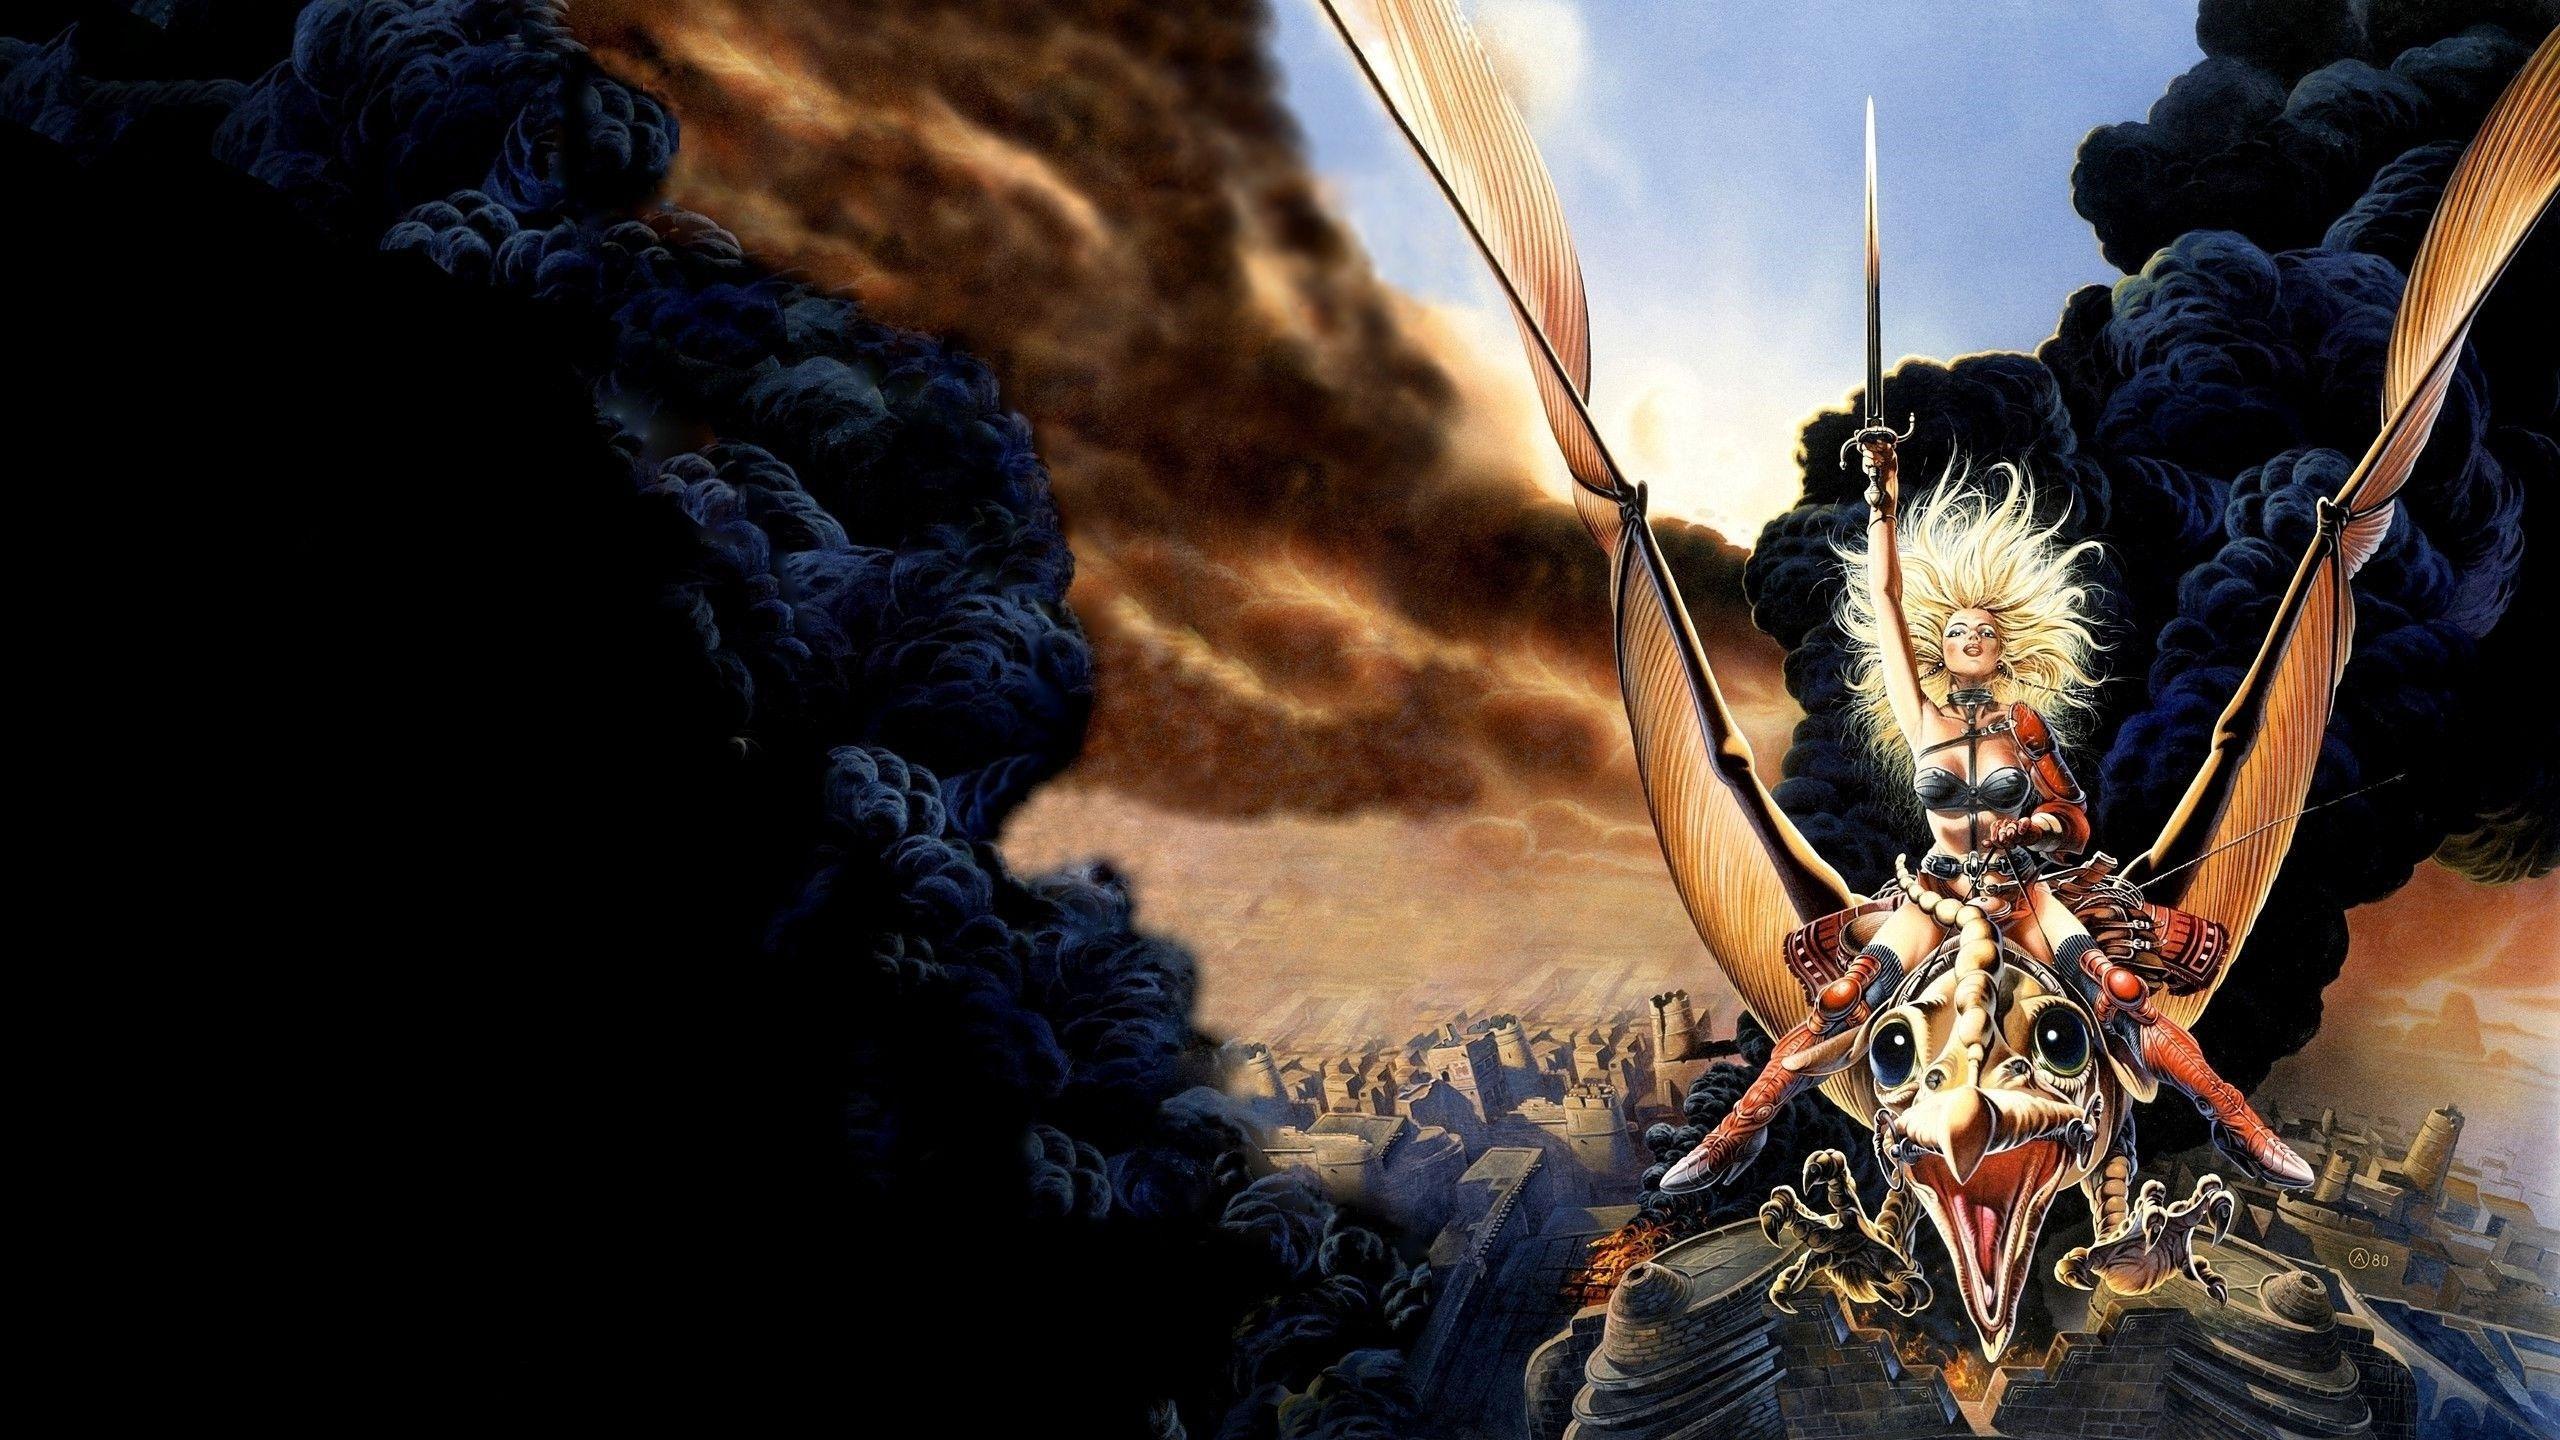 Heavy Metal Movie Wallpapers Wallpaper Cave